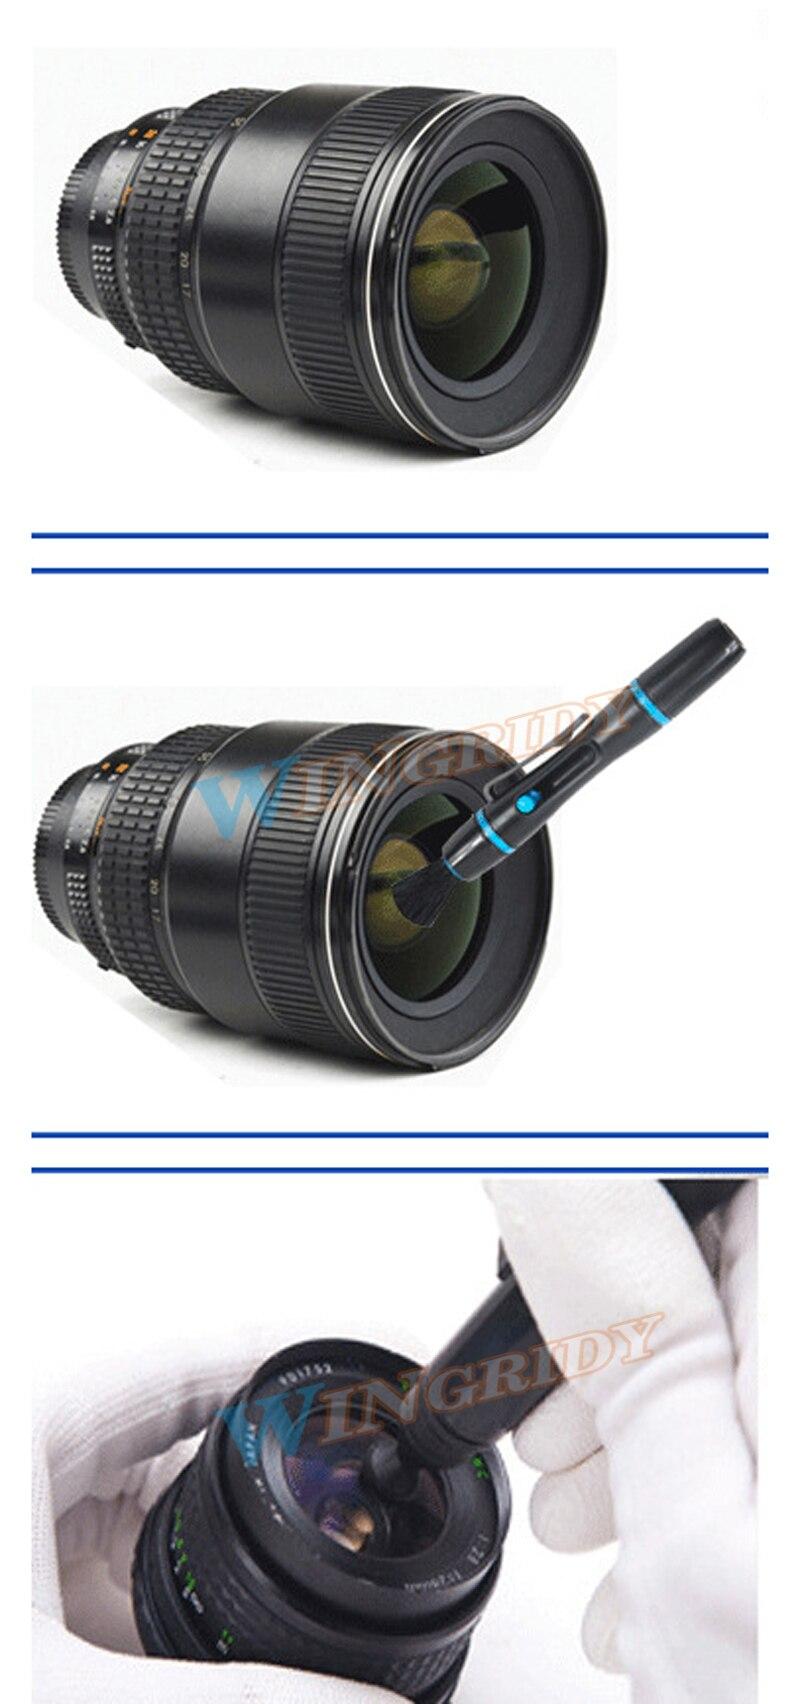 lenspen camera cleaning (5)